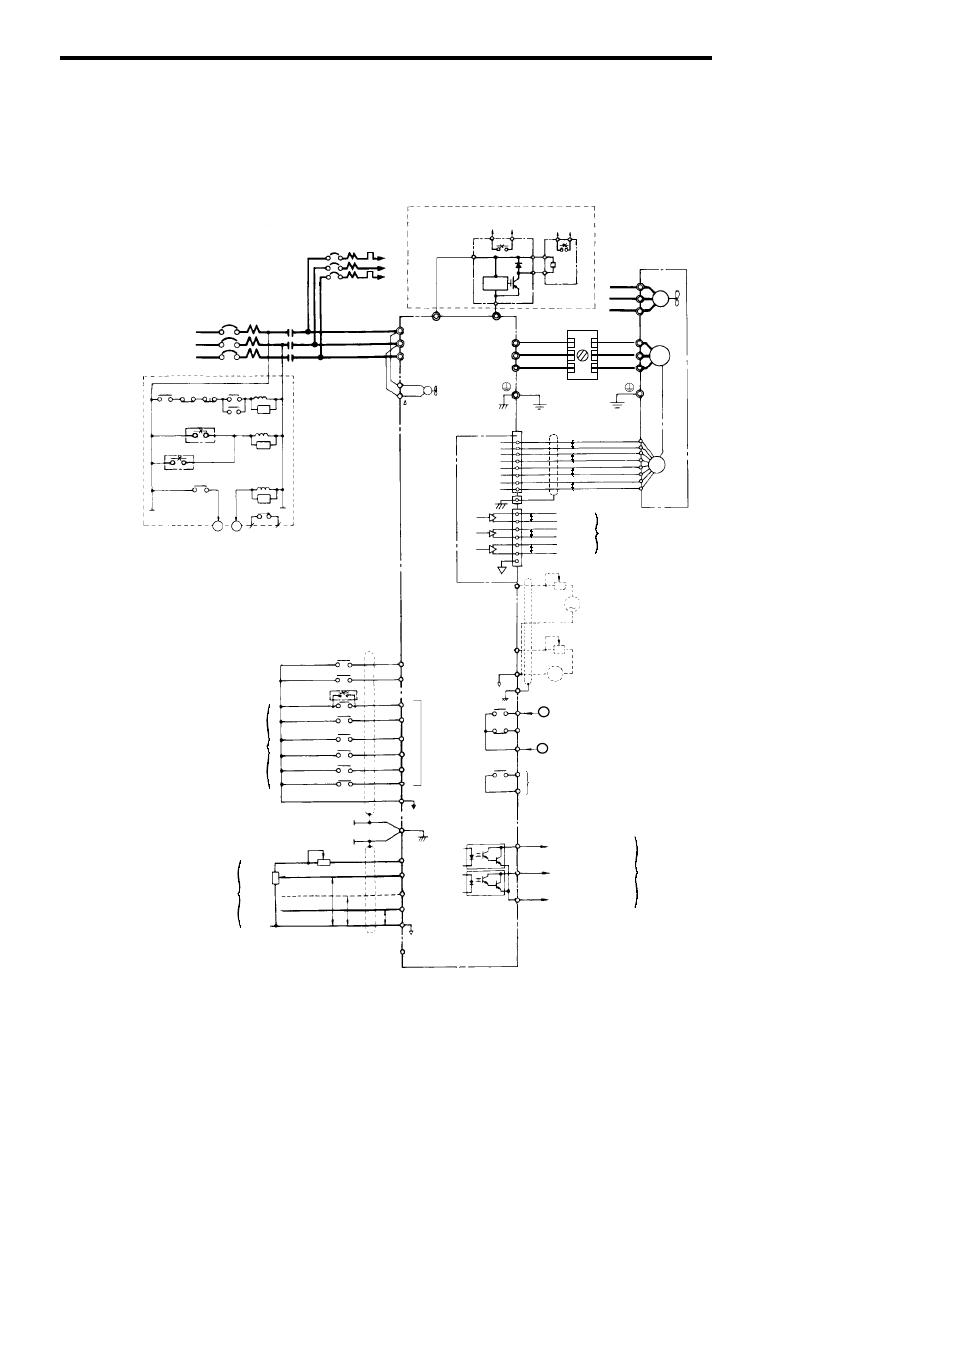 2 Connection Diagram  Fig  7 Connection Diagram